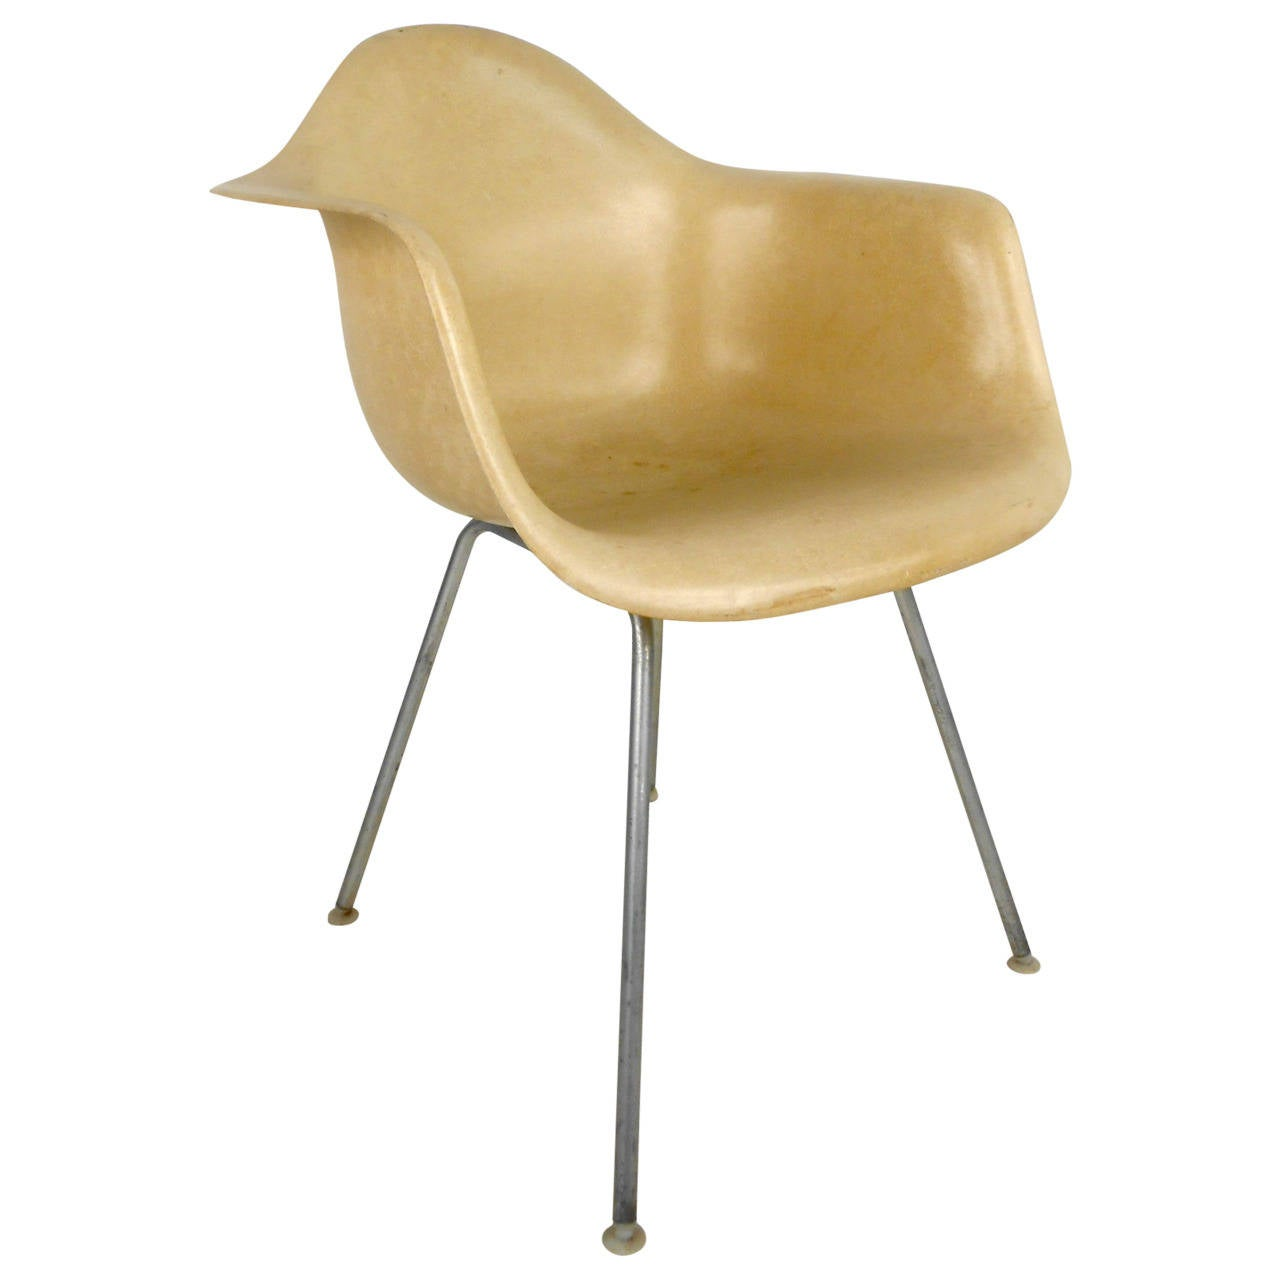 fiberglass shell chair swings outdoor mid century modern by eames for herman miller sale